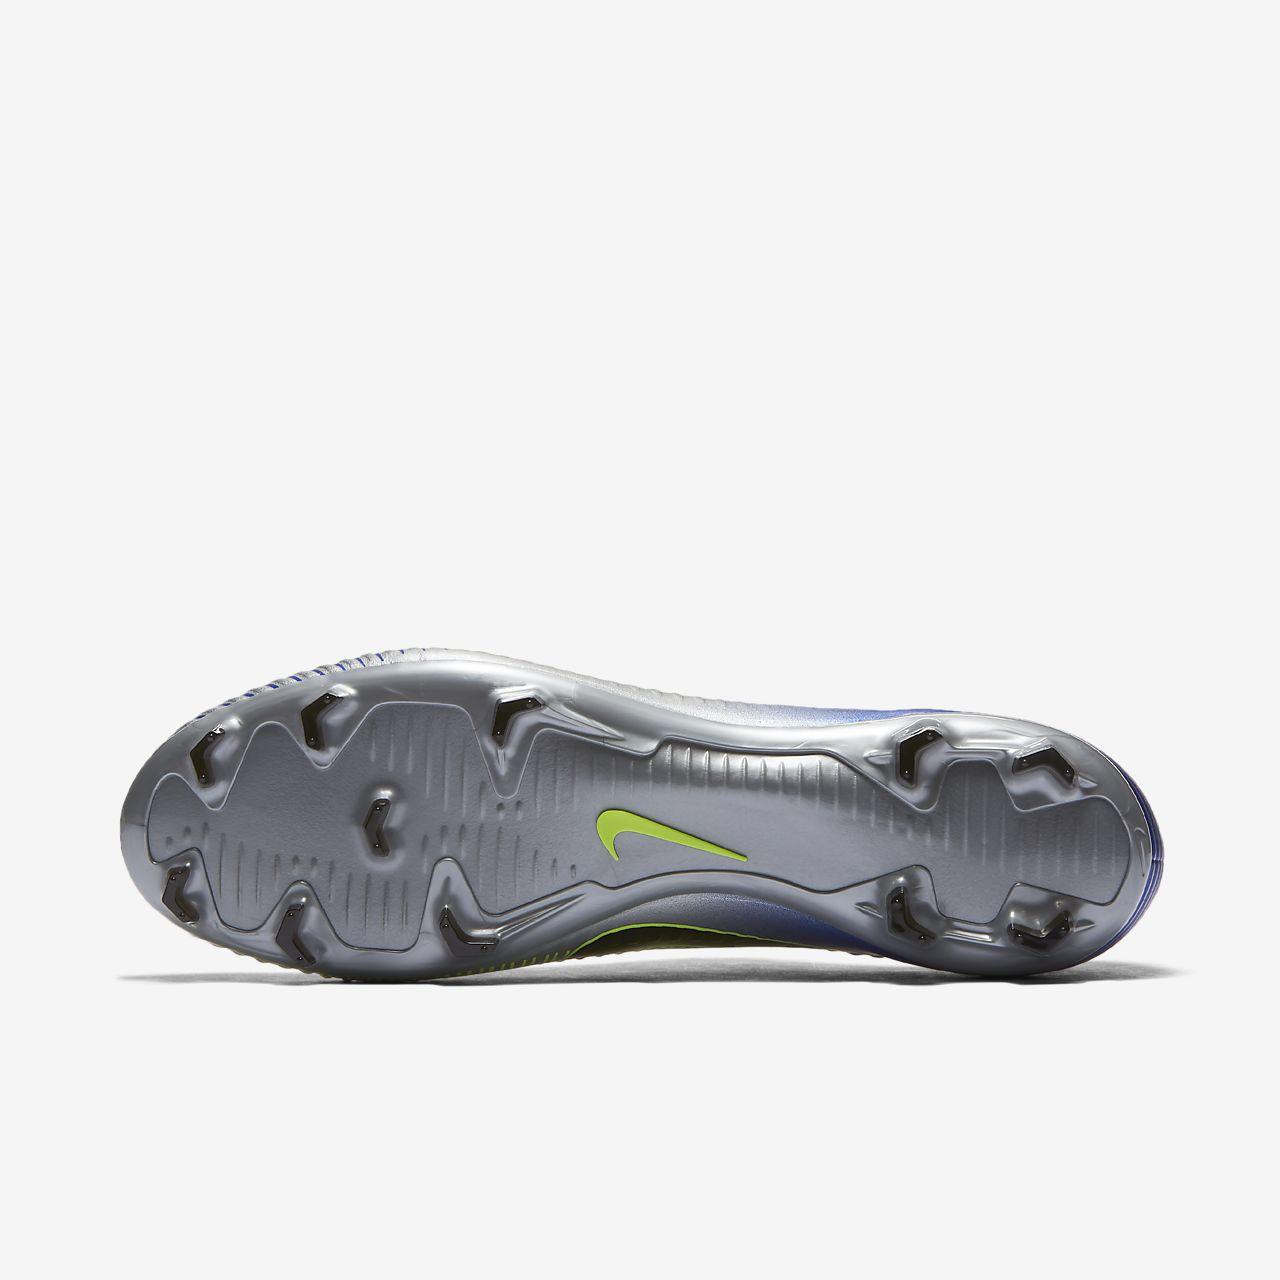 ... Nike Mercurial Veloce III Neymar Firm-Ground Football Boot